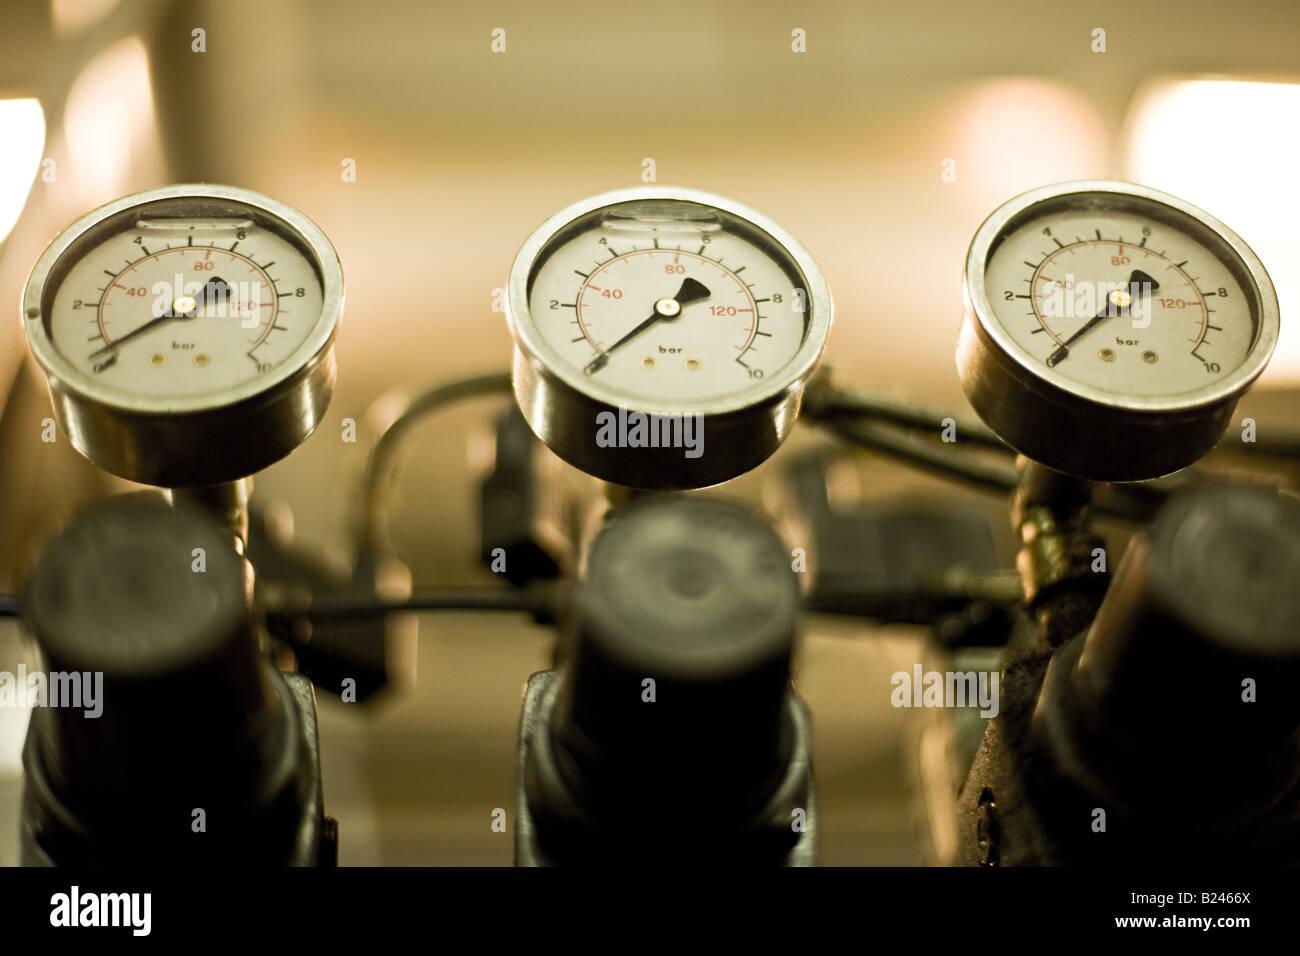 Pressure indicators - Stock Image